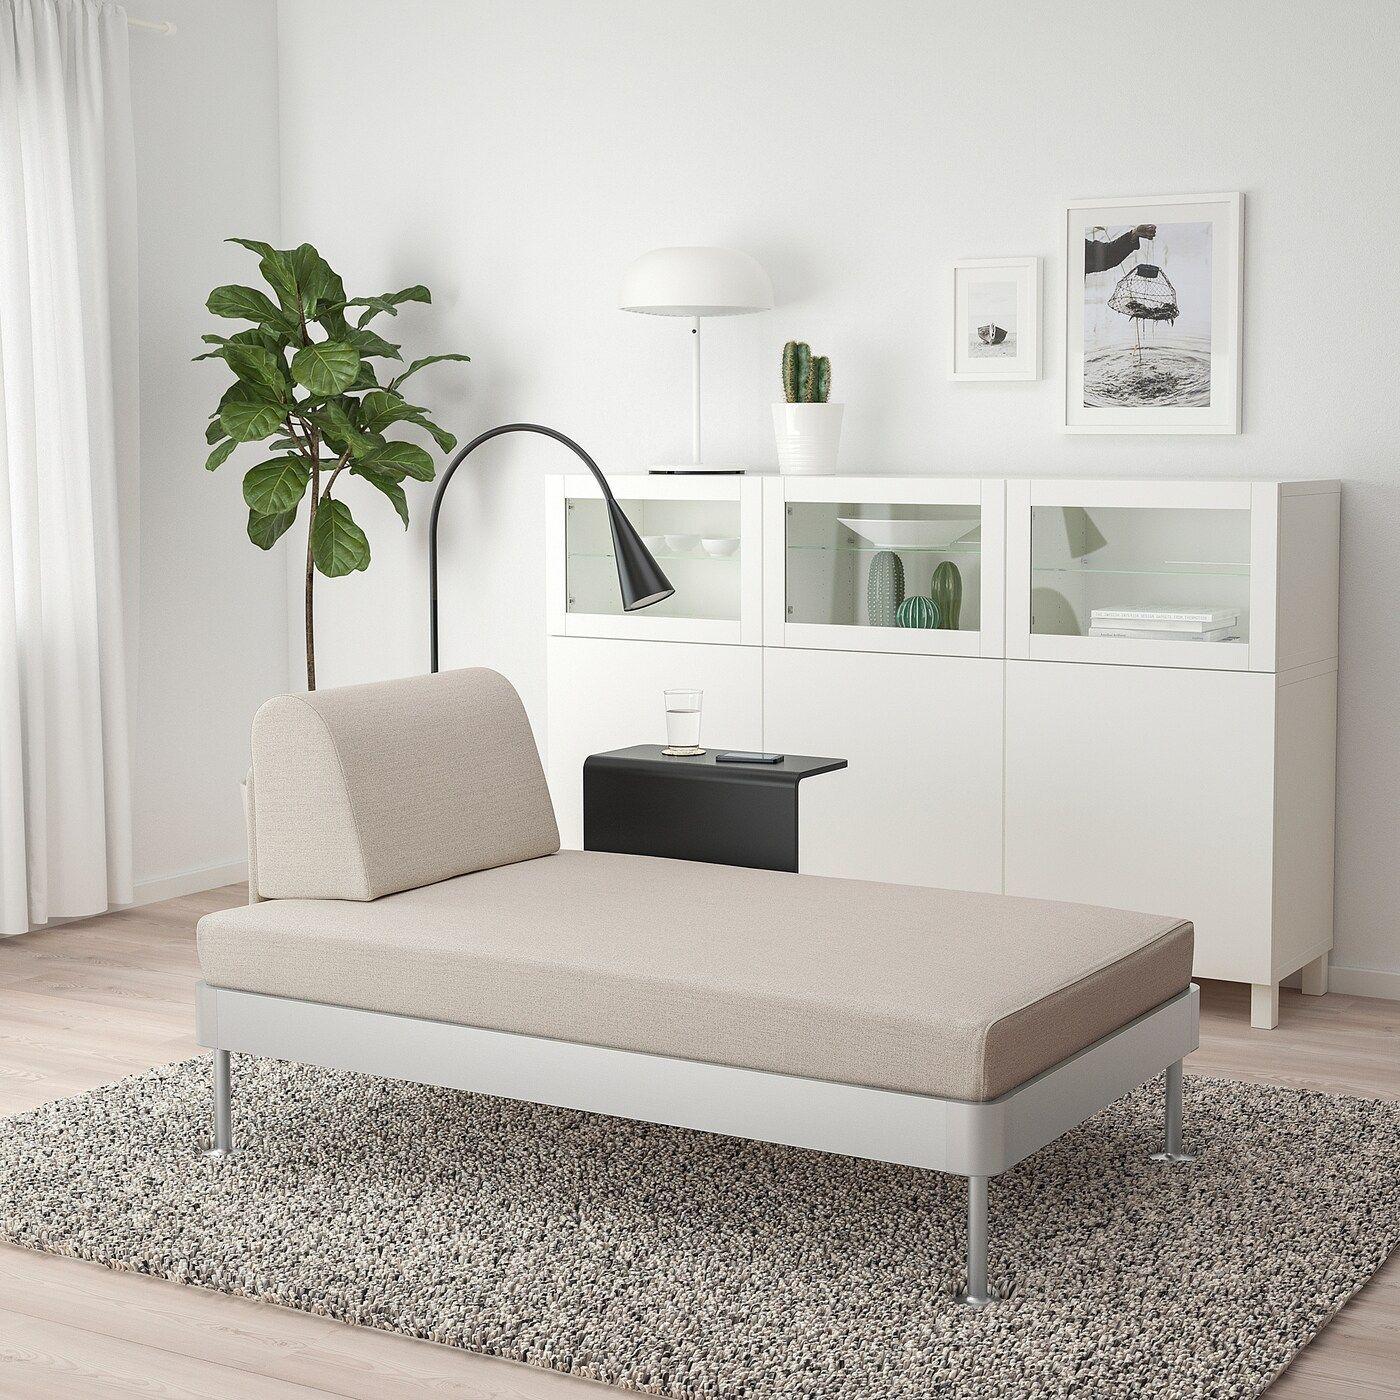 Ikea Delaktig R Ablage Delaktig Ikea In 2020 Chaise Ikea Chaise Longue